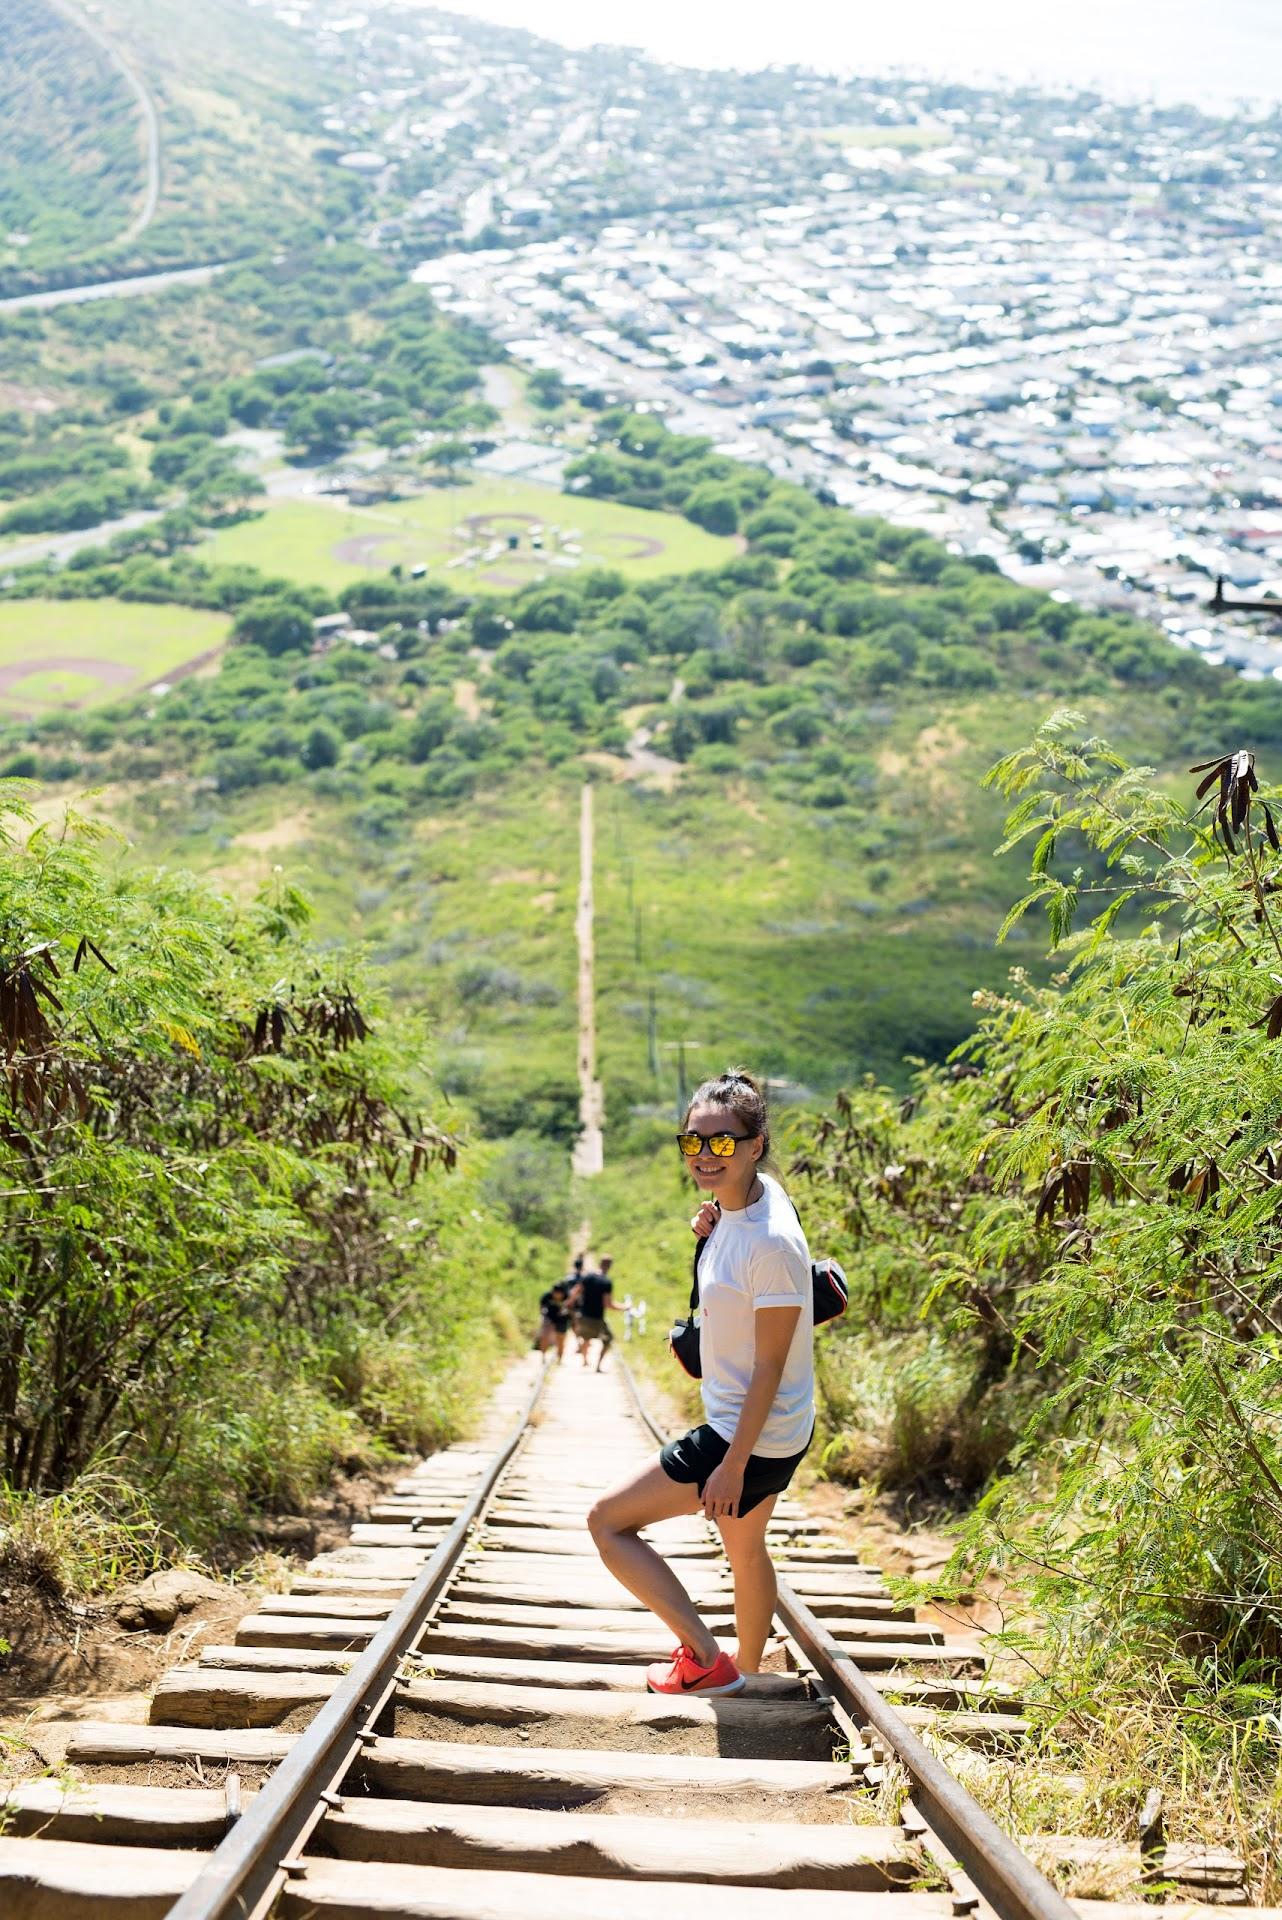 oahu, koko head trail, railway trail, oahu hiking, workout, island, travel blogger, hawaii travel tips, things to do, asian blogger,